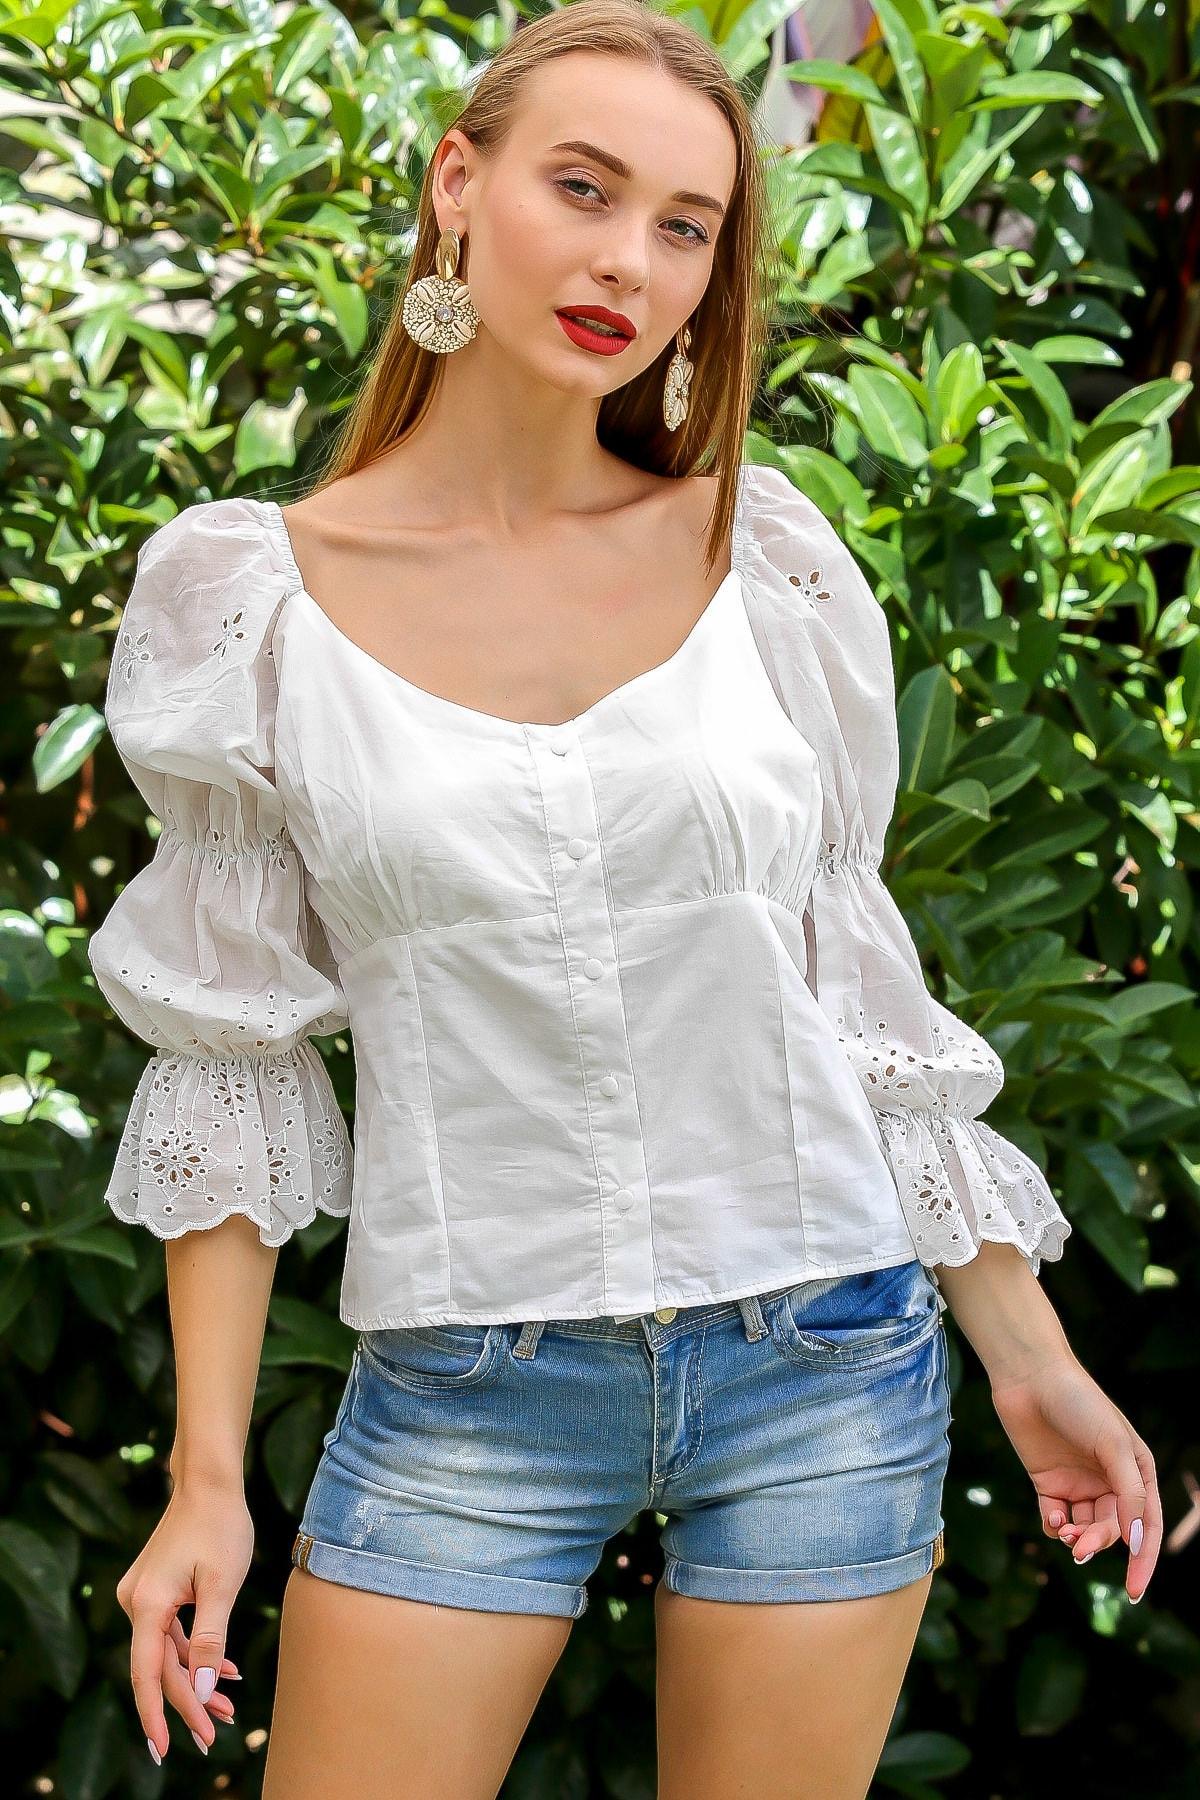 Kadın Beyaz Romantik Yaka Düğmeli Kolları Fisto Büzgü Detaylı Uçları Dilimli Bluz M10010200Bl96091